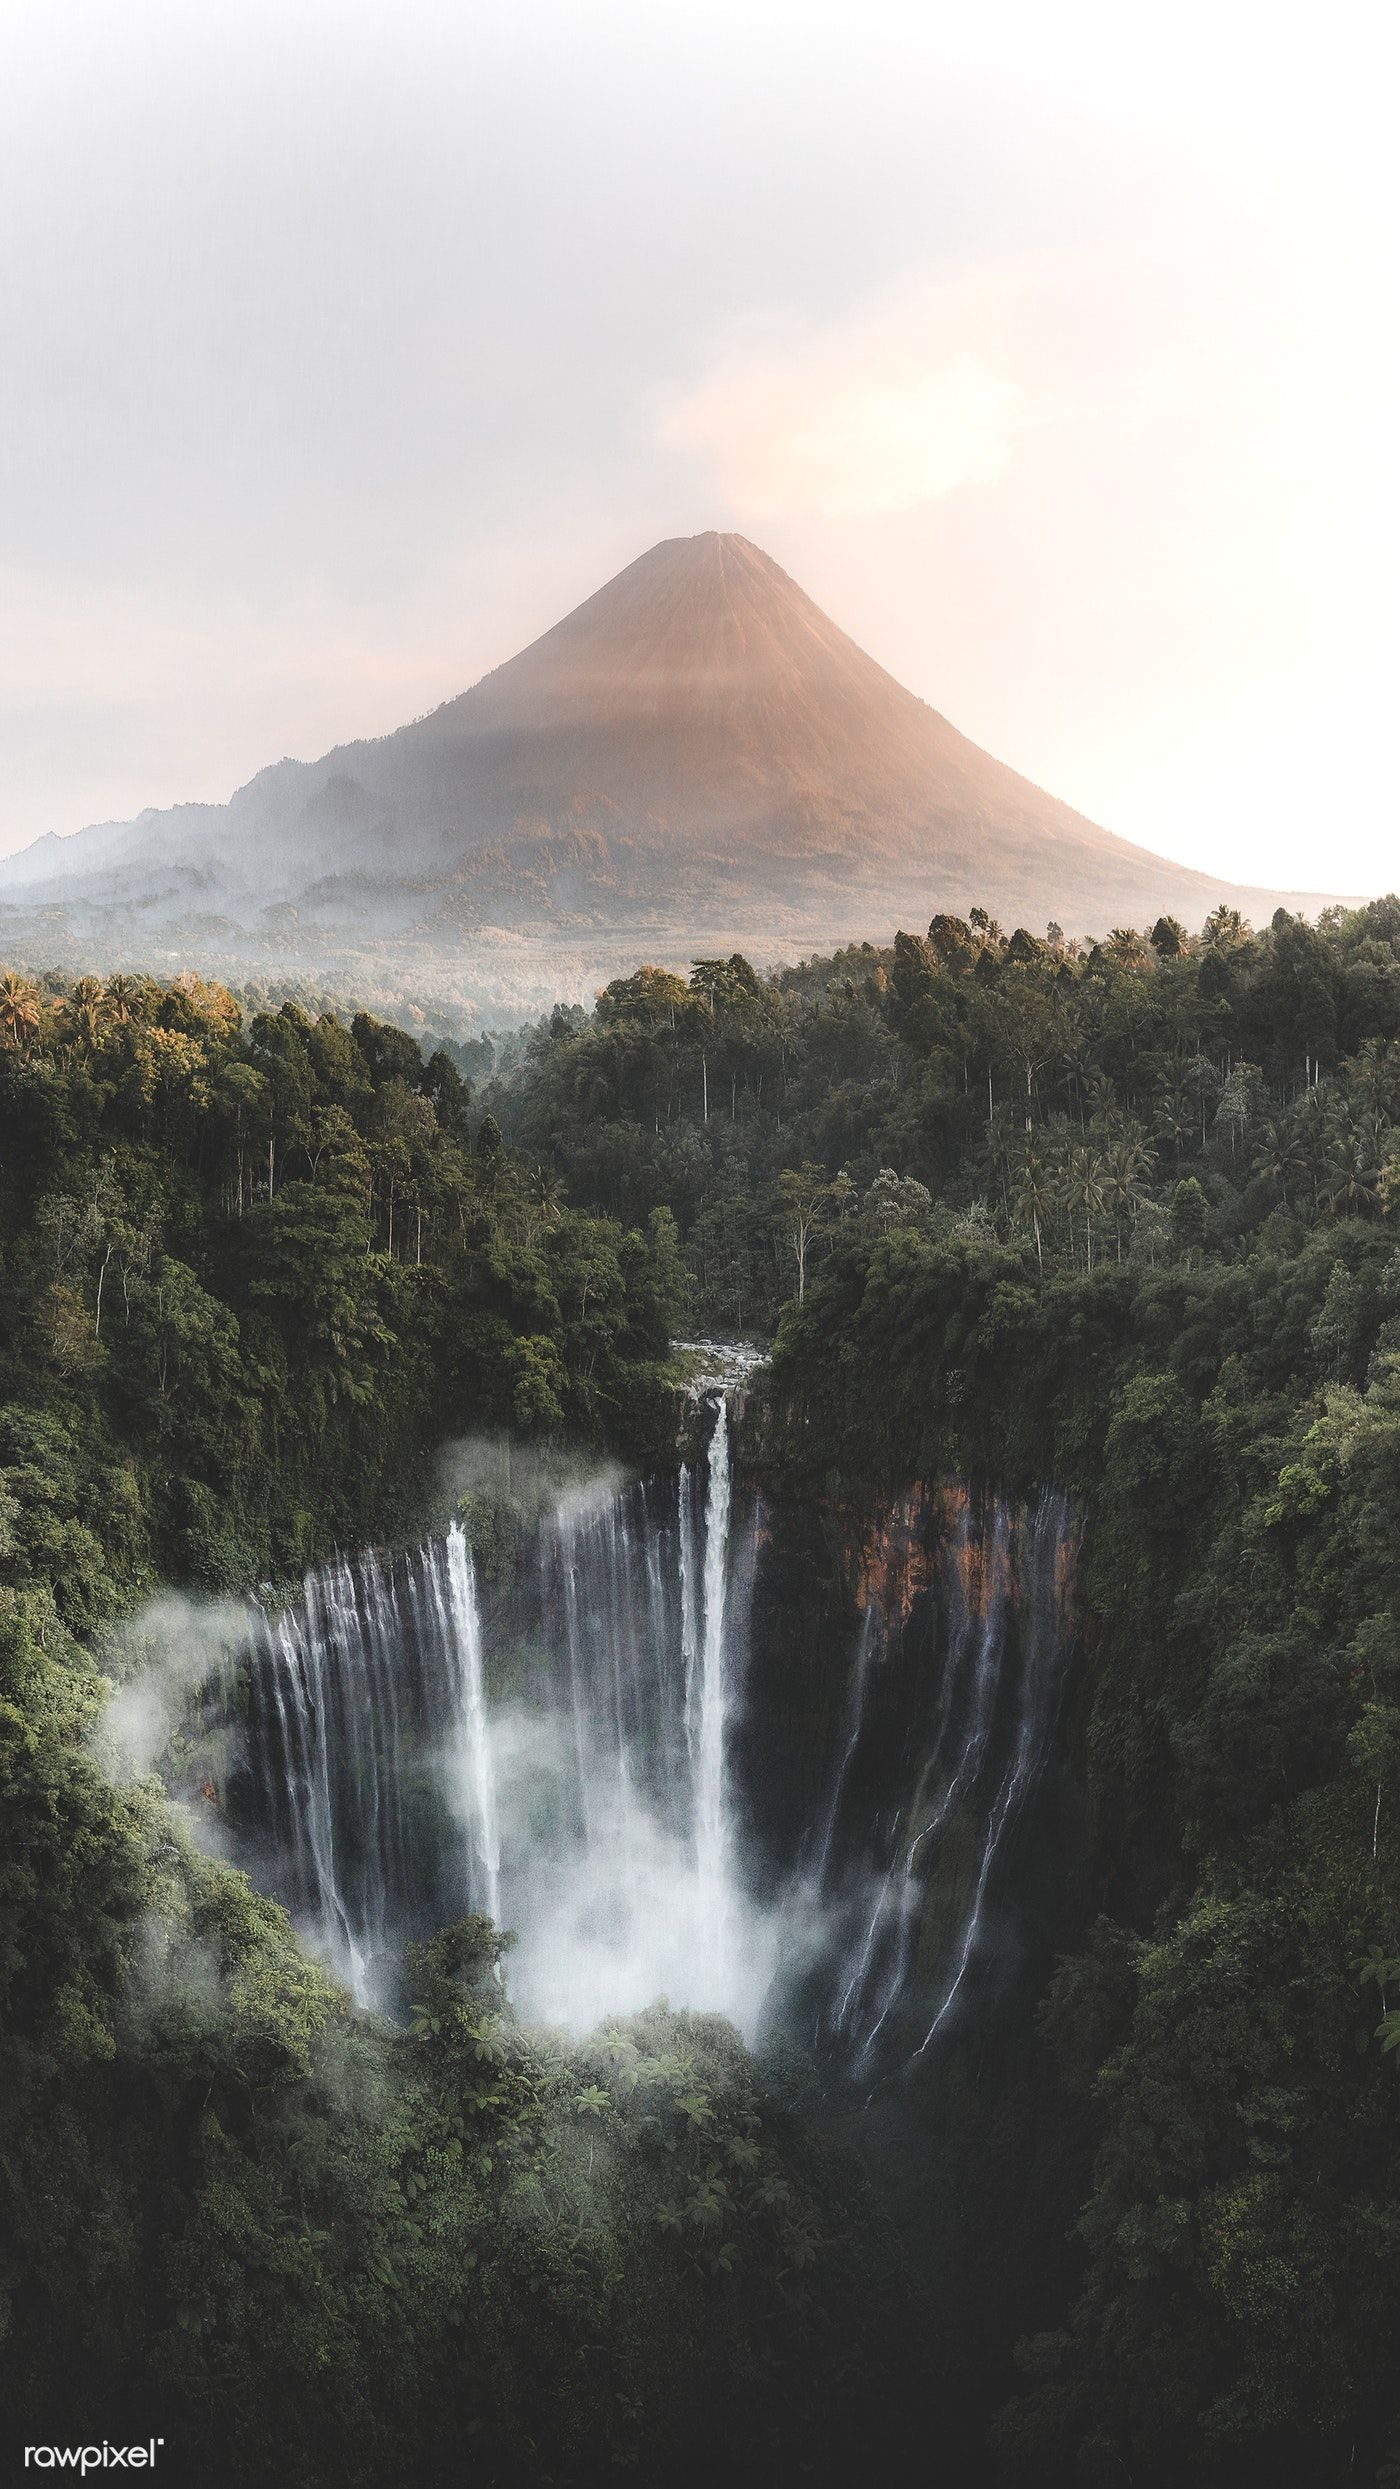 Download premium image of View of Mount Bromo and Tumpak